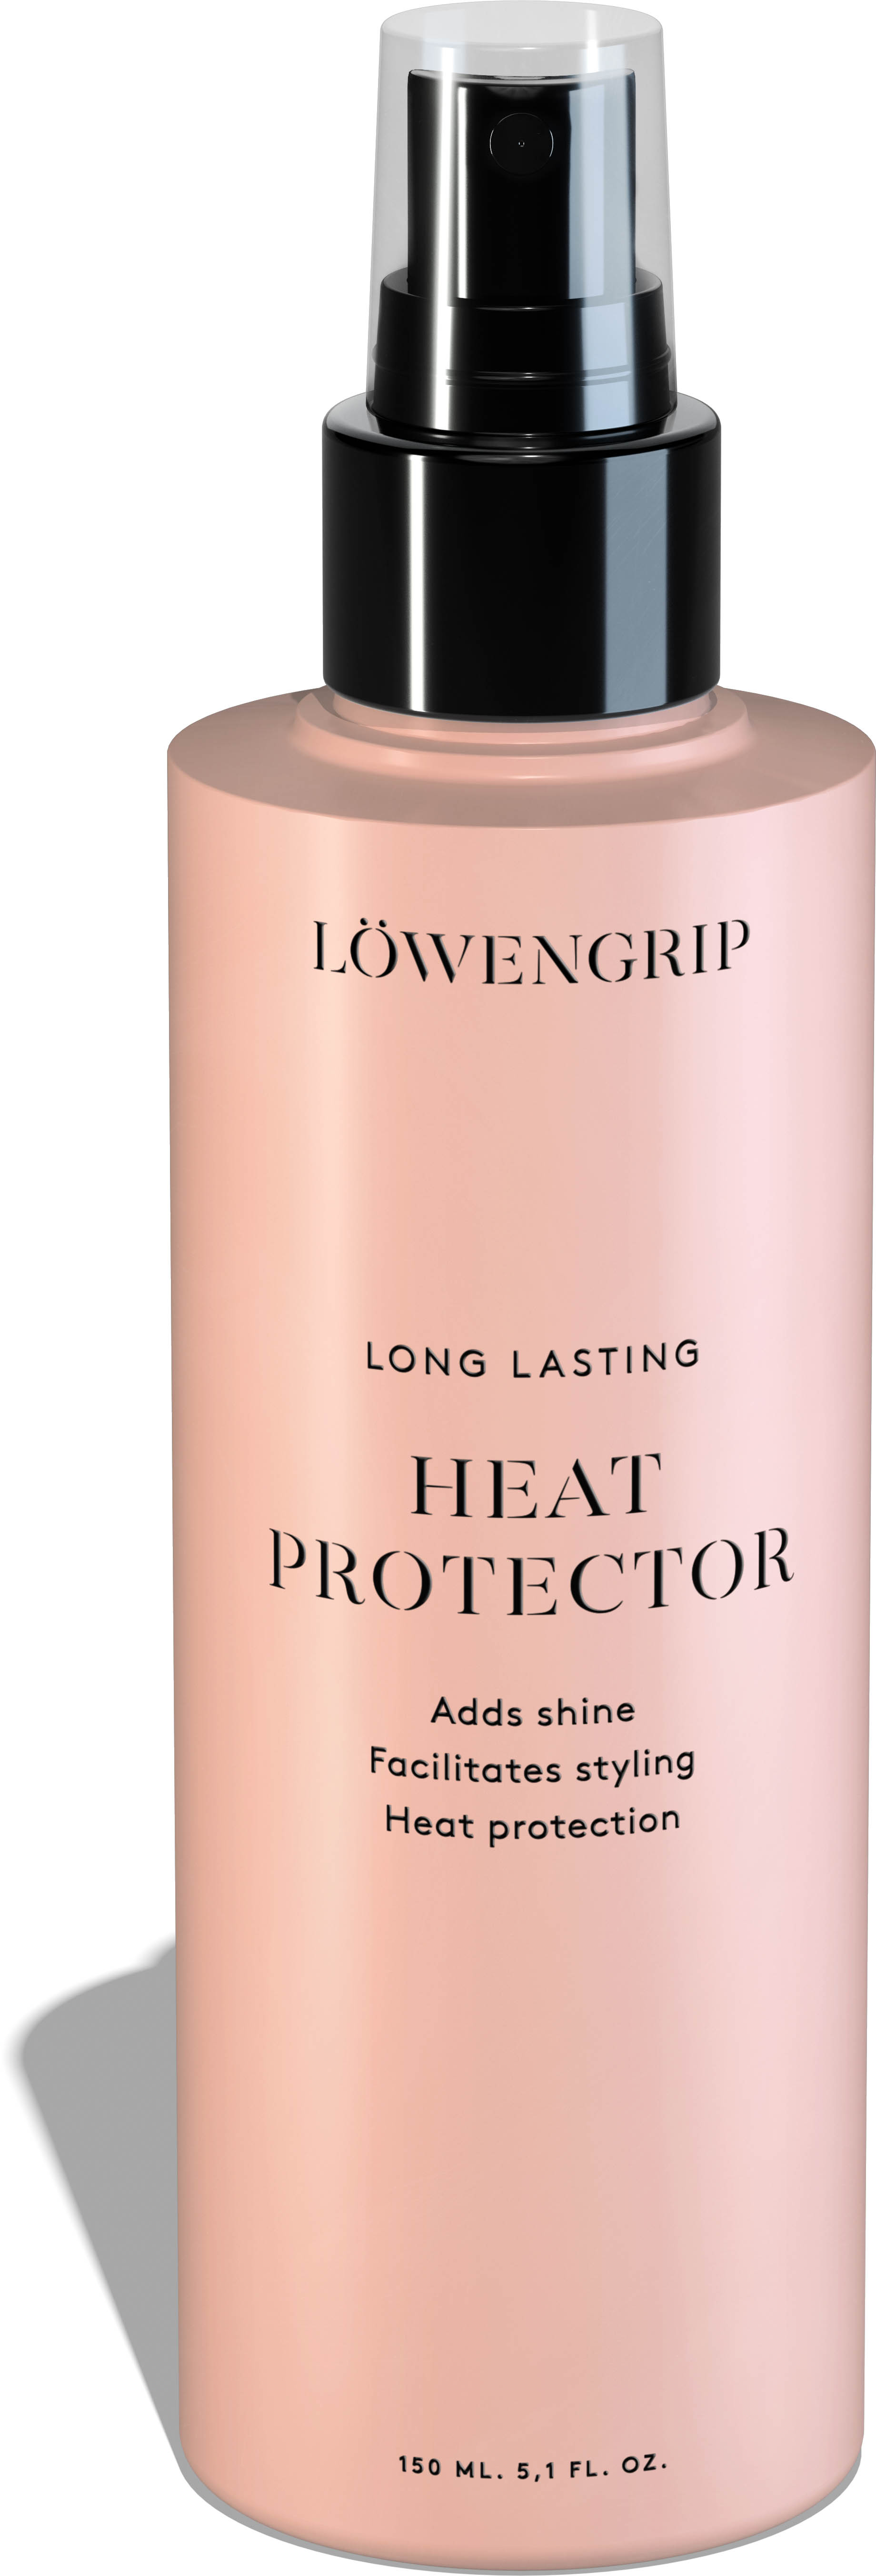 Long Lasting - Heat Protector 150ml